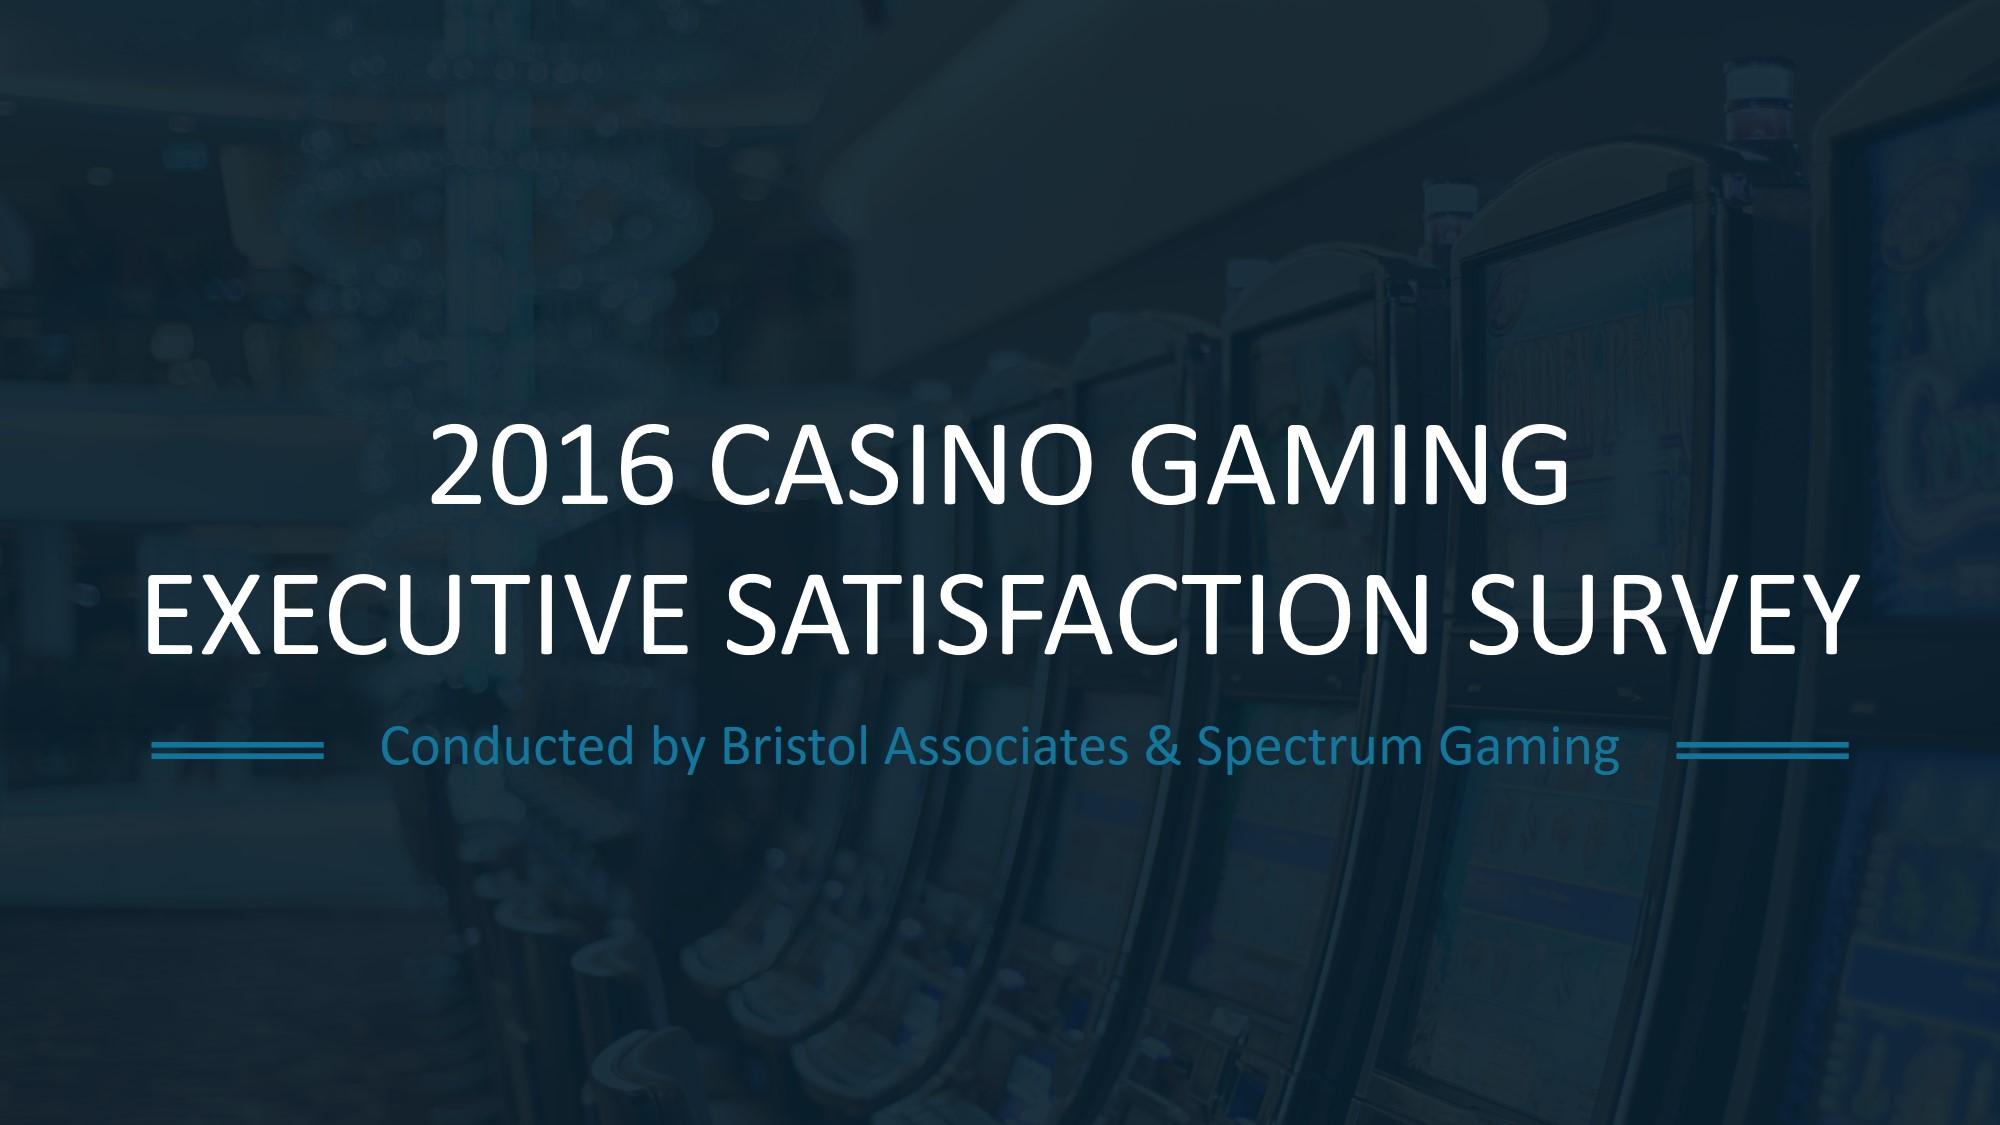 2016 Casino Gaming Executive Satisfaction Survey